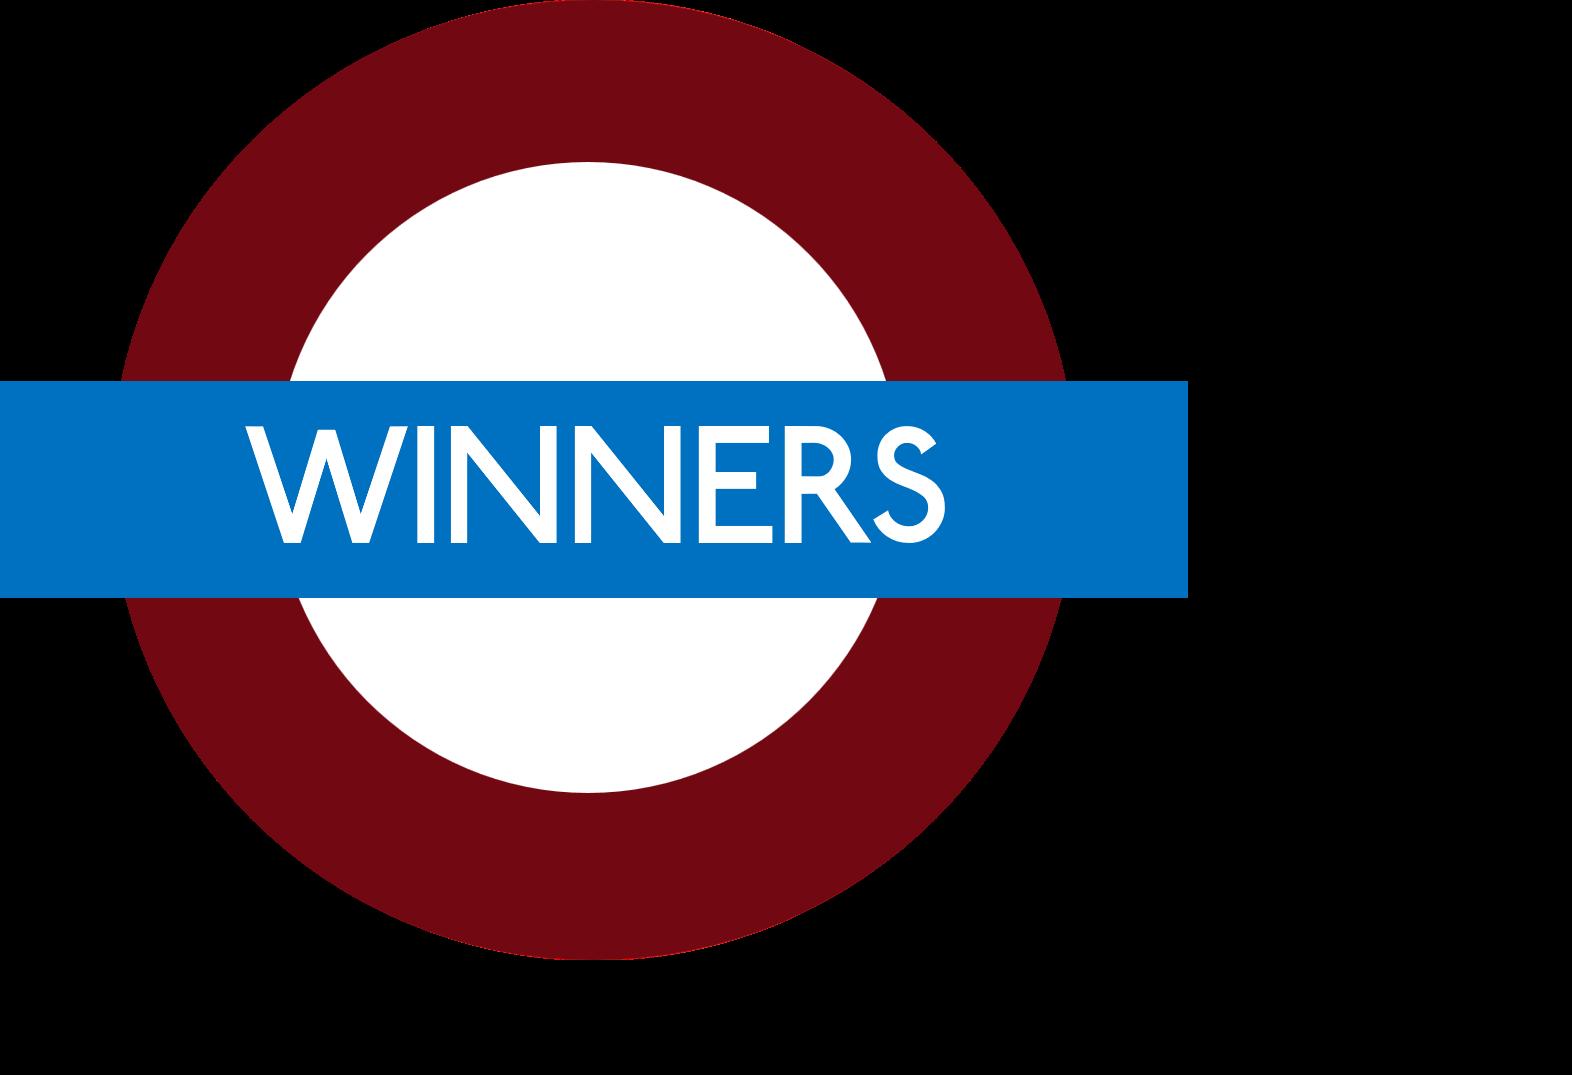 winners logo proposed